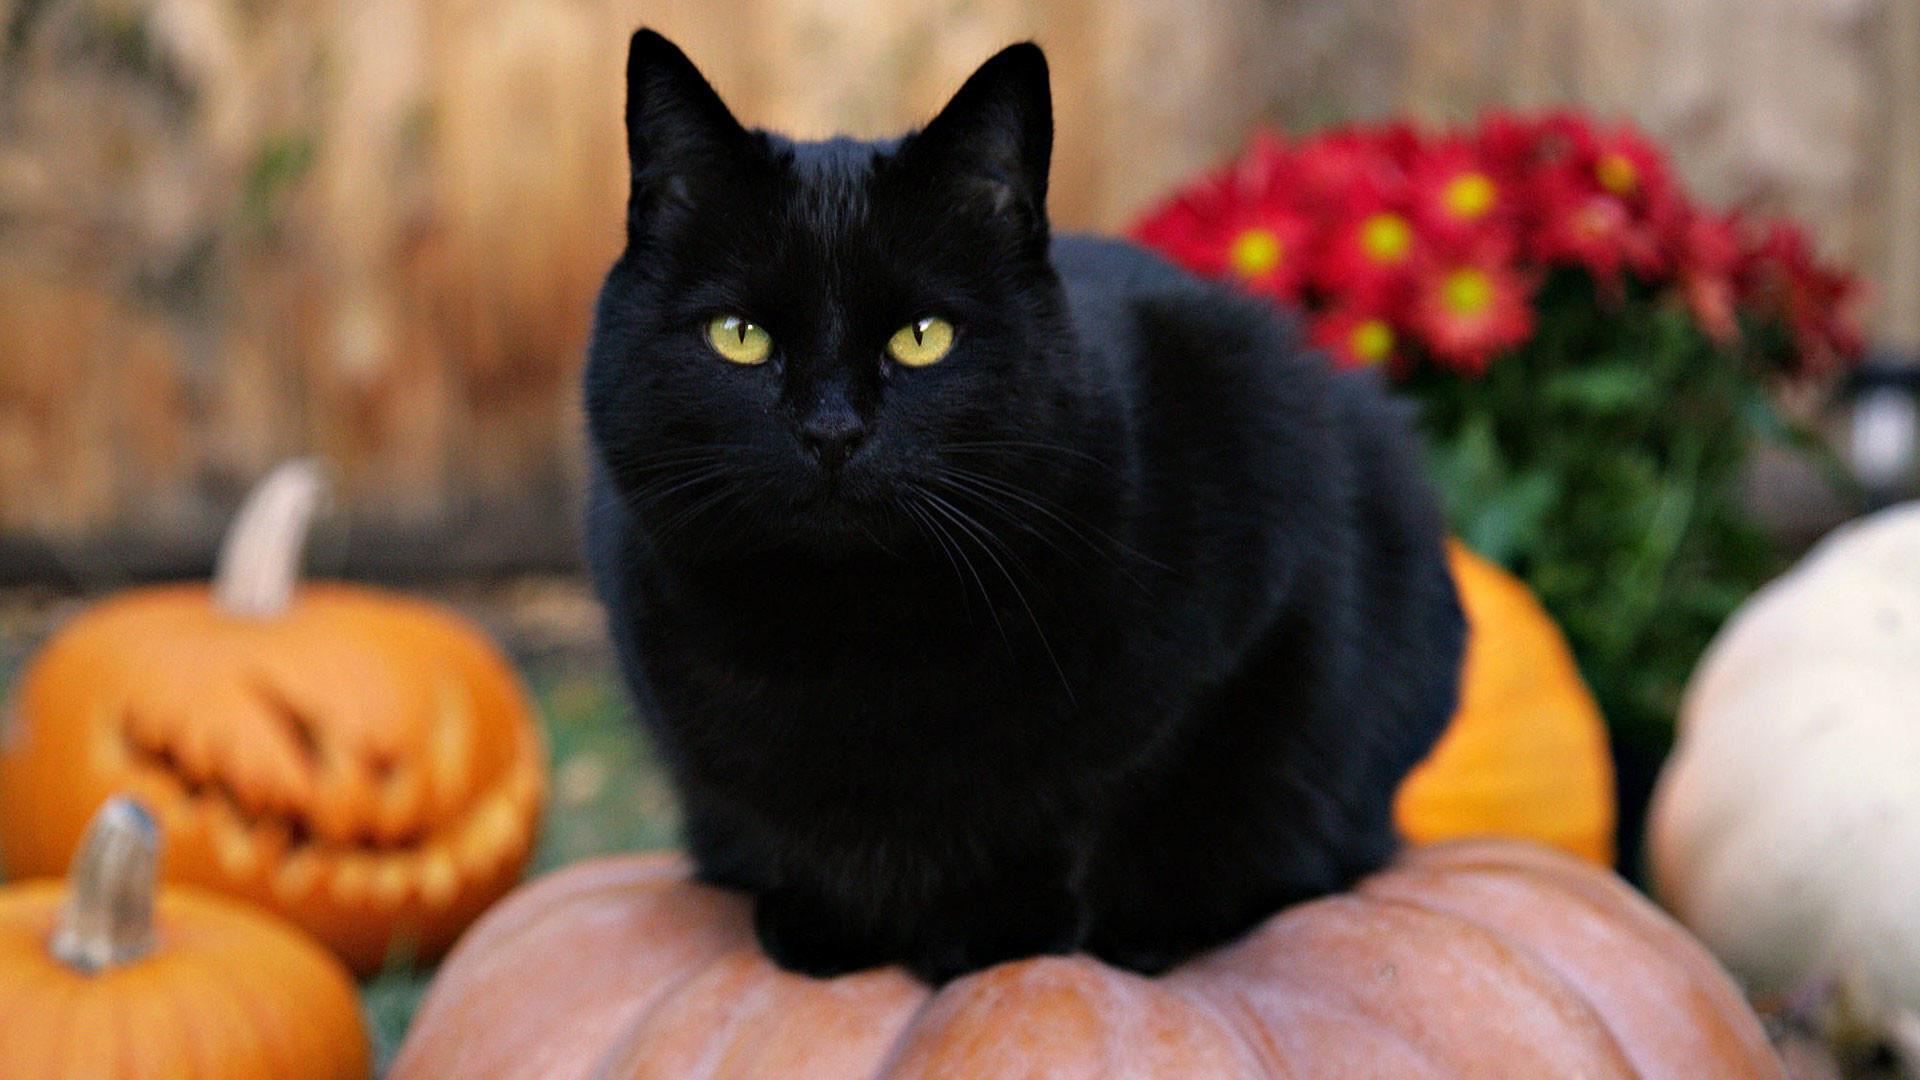 Black Kitten And Halloween Pumpkins Wallpapers Wallpaper Cave